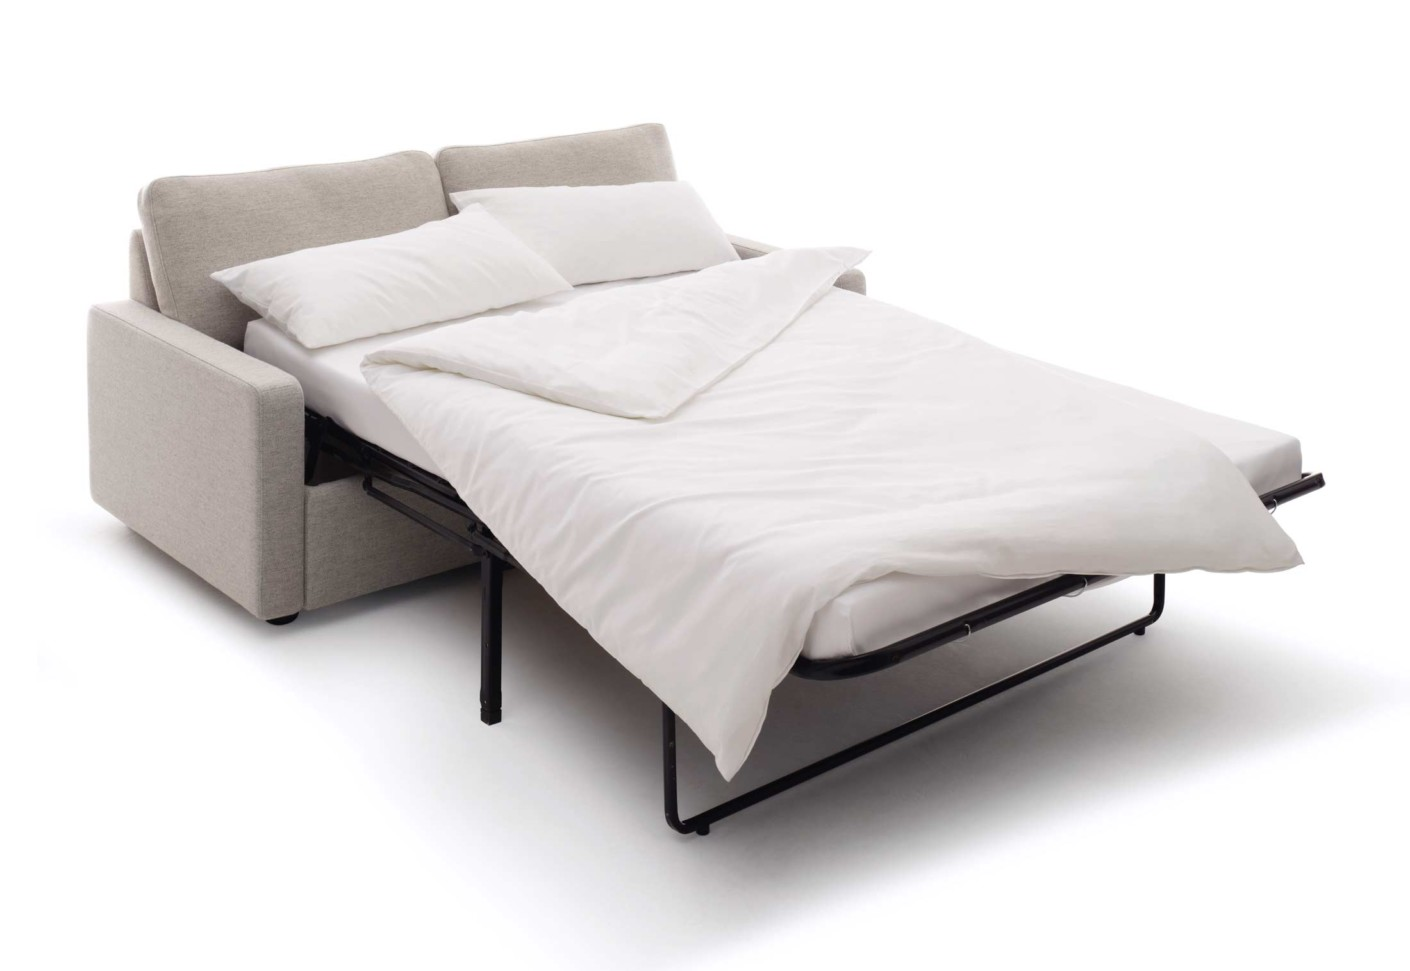 conseta schlafsofa von cor stylepark. Black Bedroom Furniture Sets. Home Design Ideas